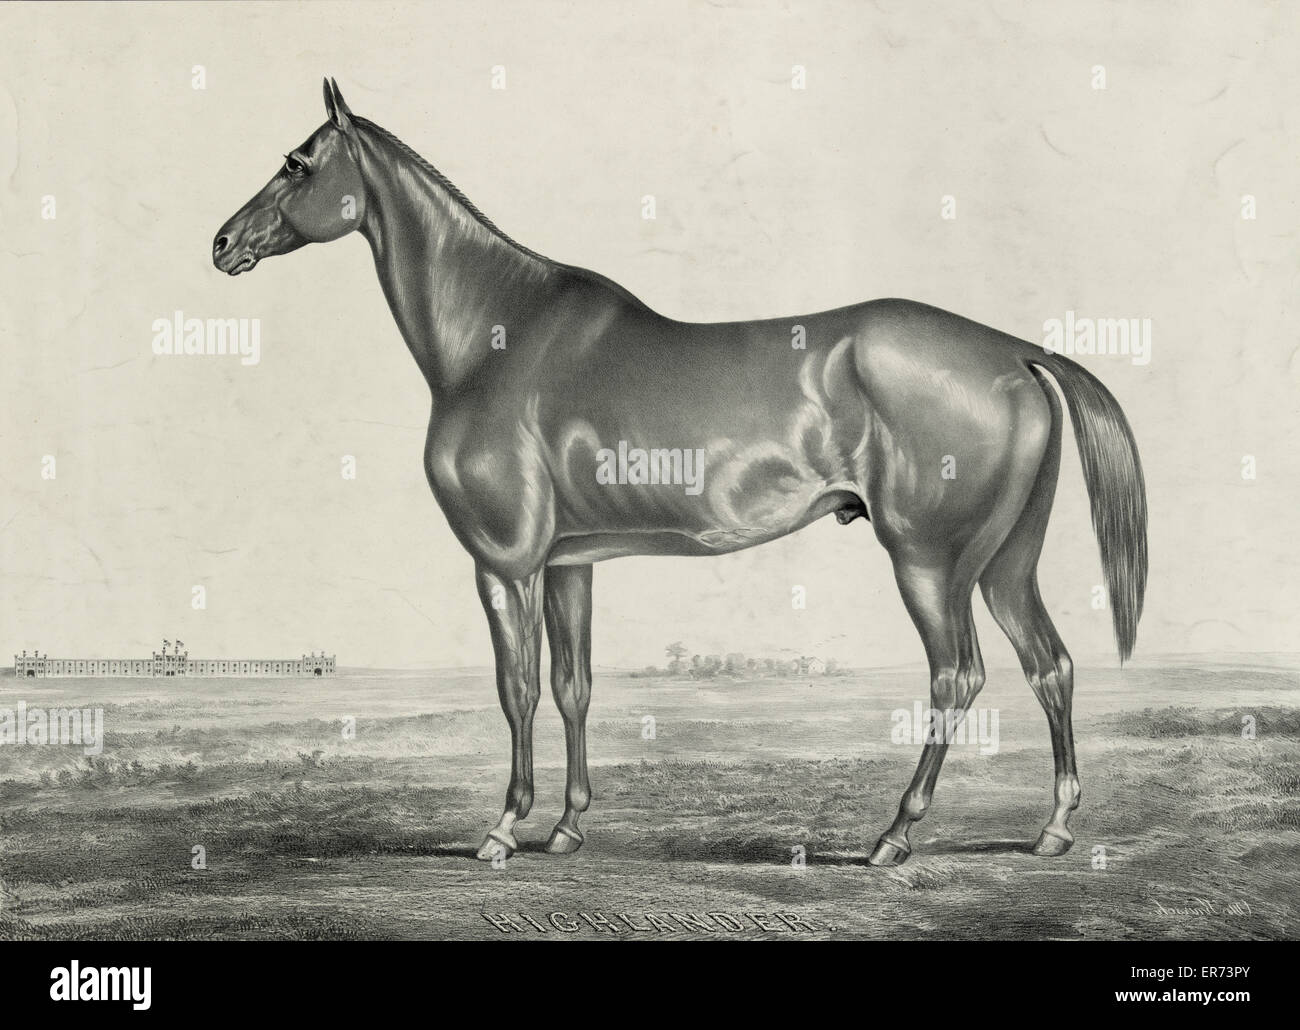 Highlander, by Glencoe, dam Castanet, by Monarch. Date c1854. - Stock Image